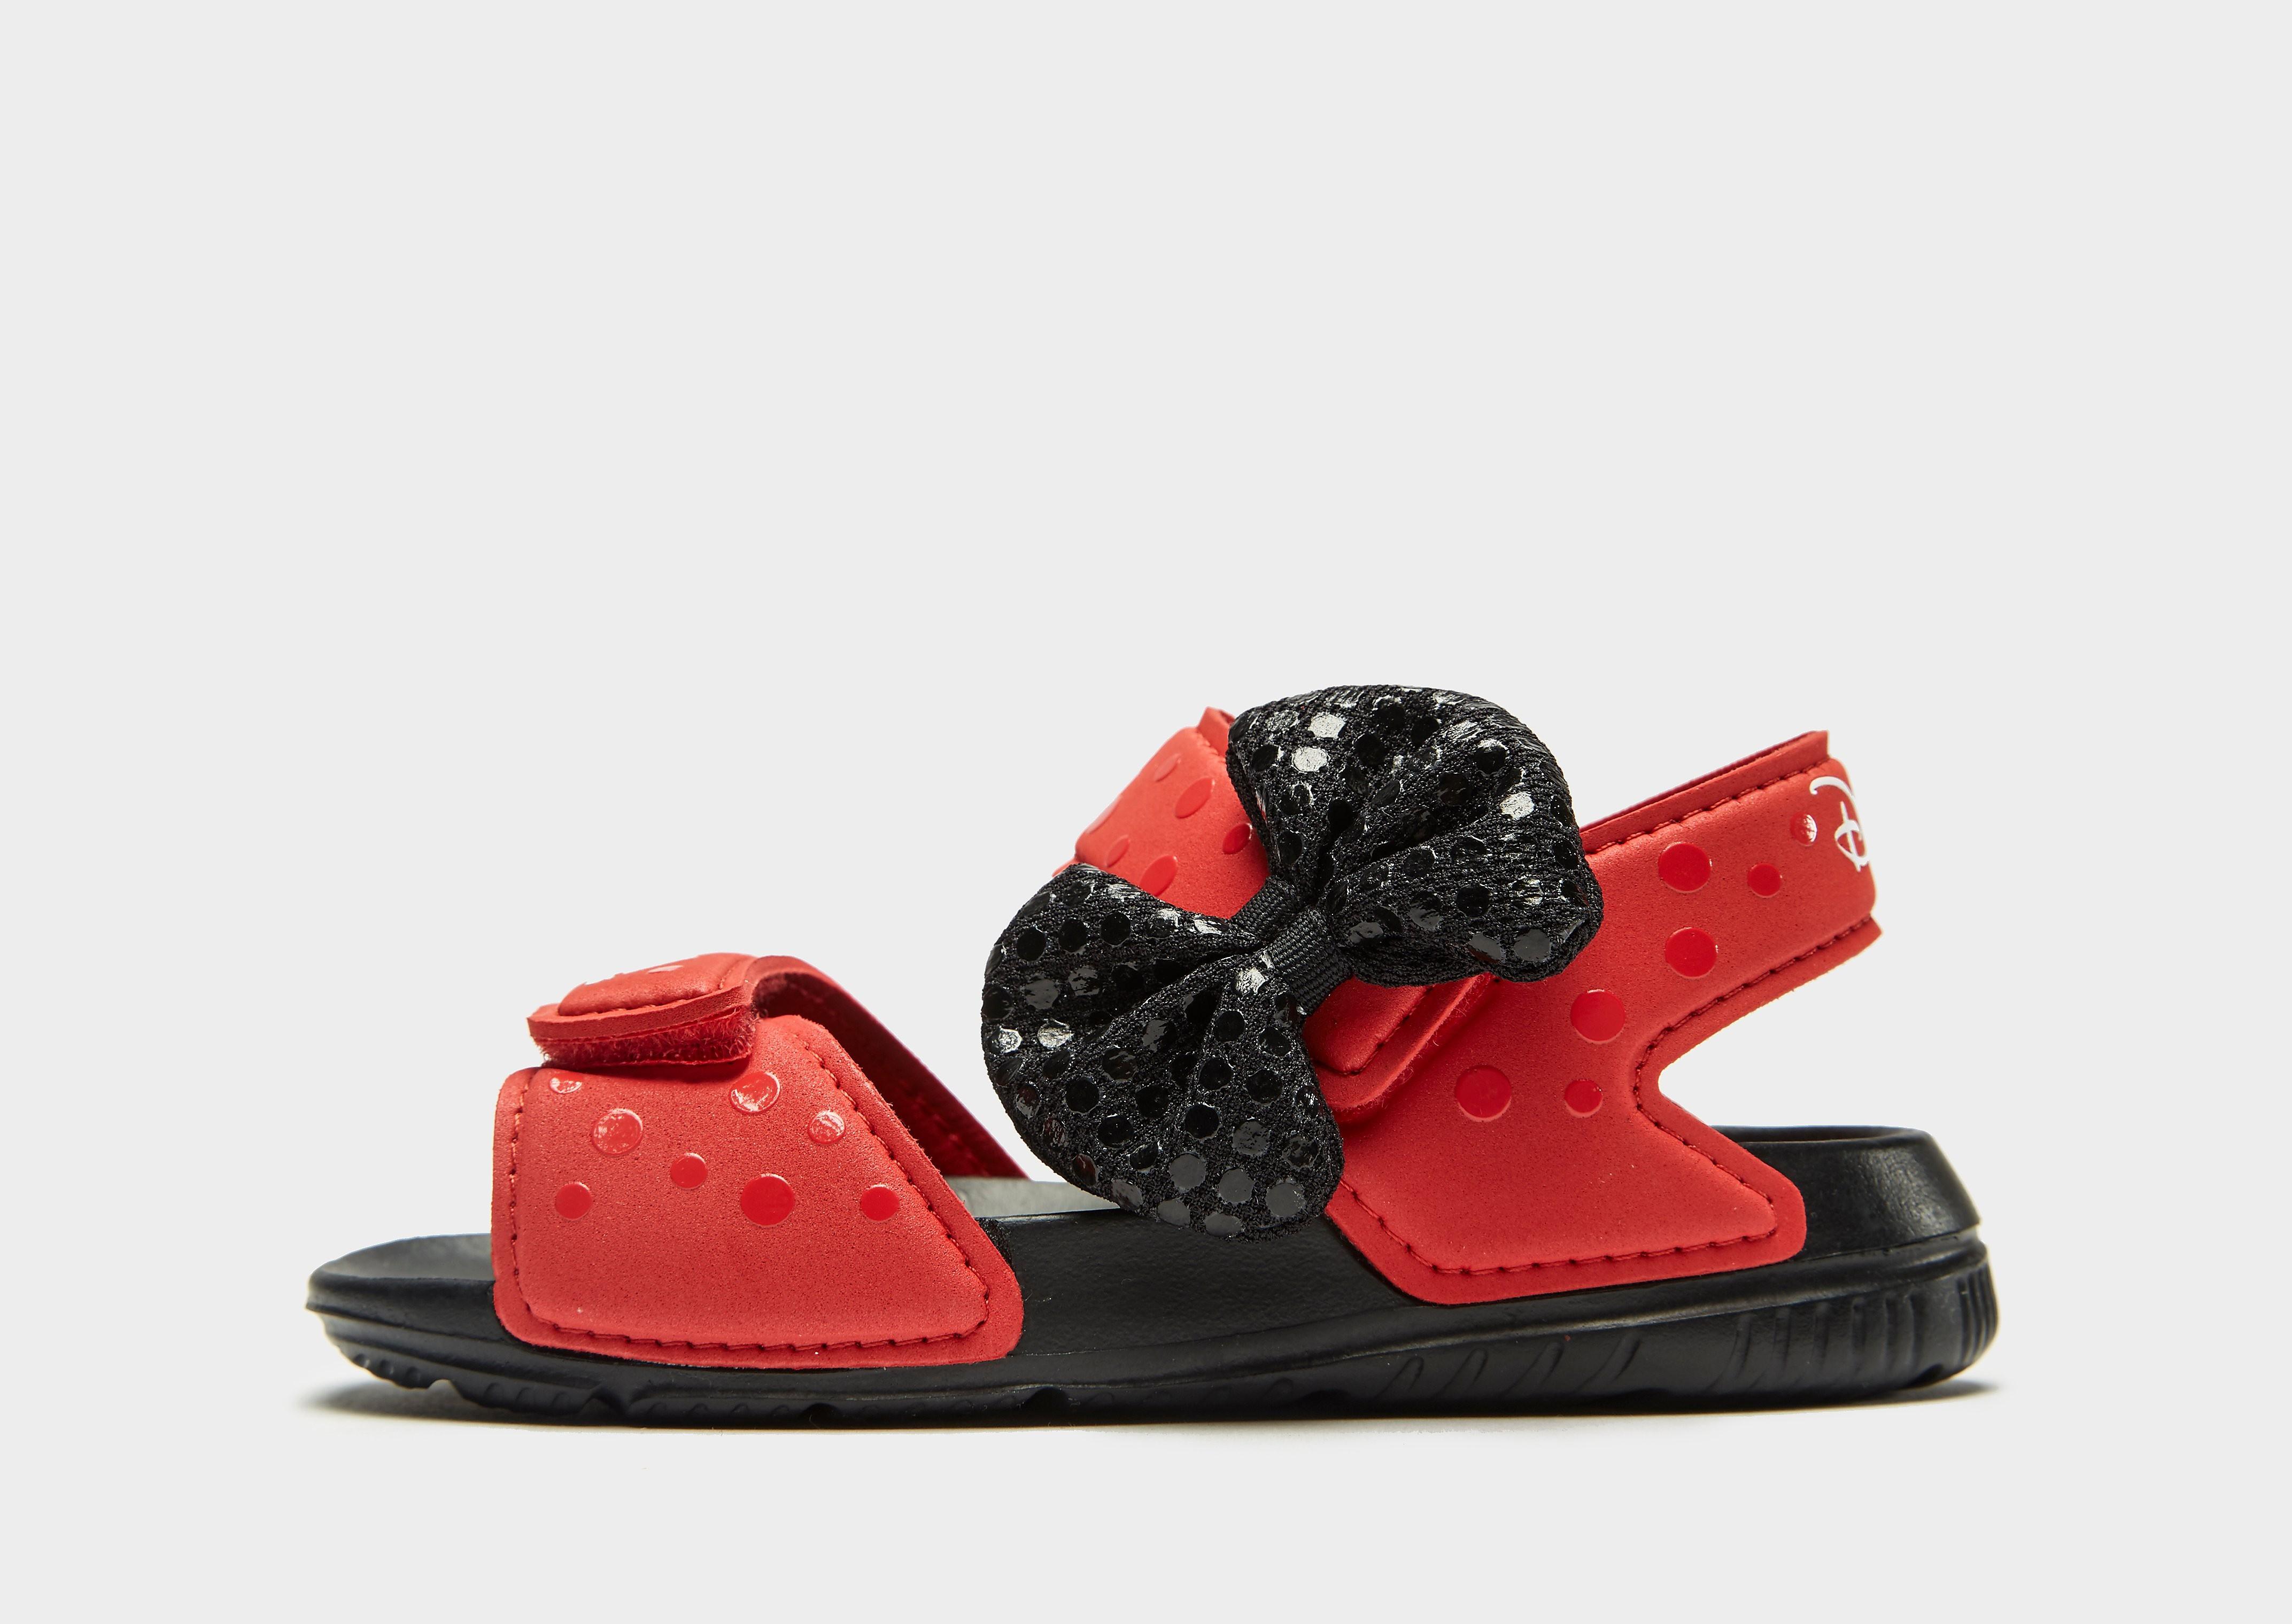 adidas Disney AltaSwim Sandals Infant